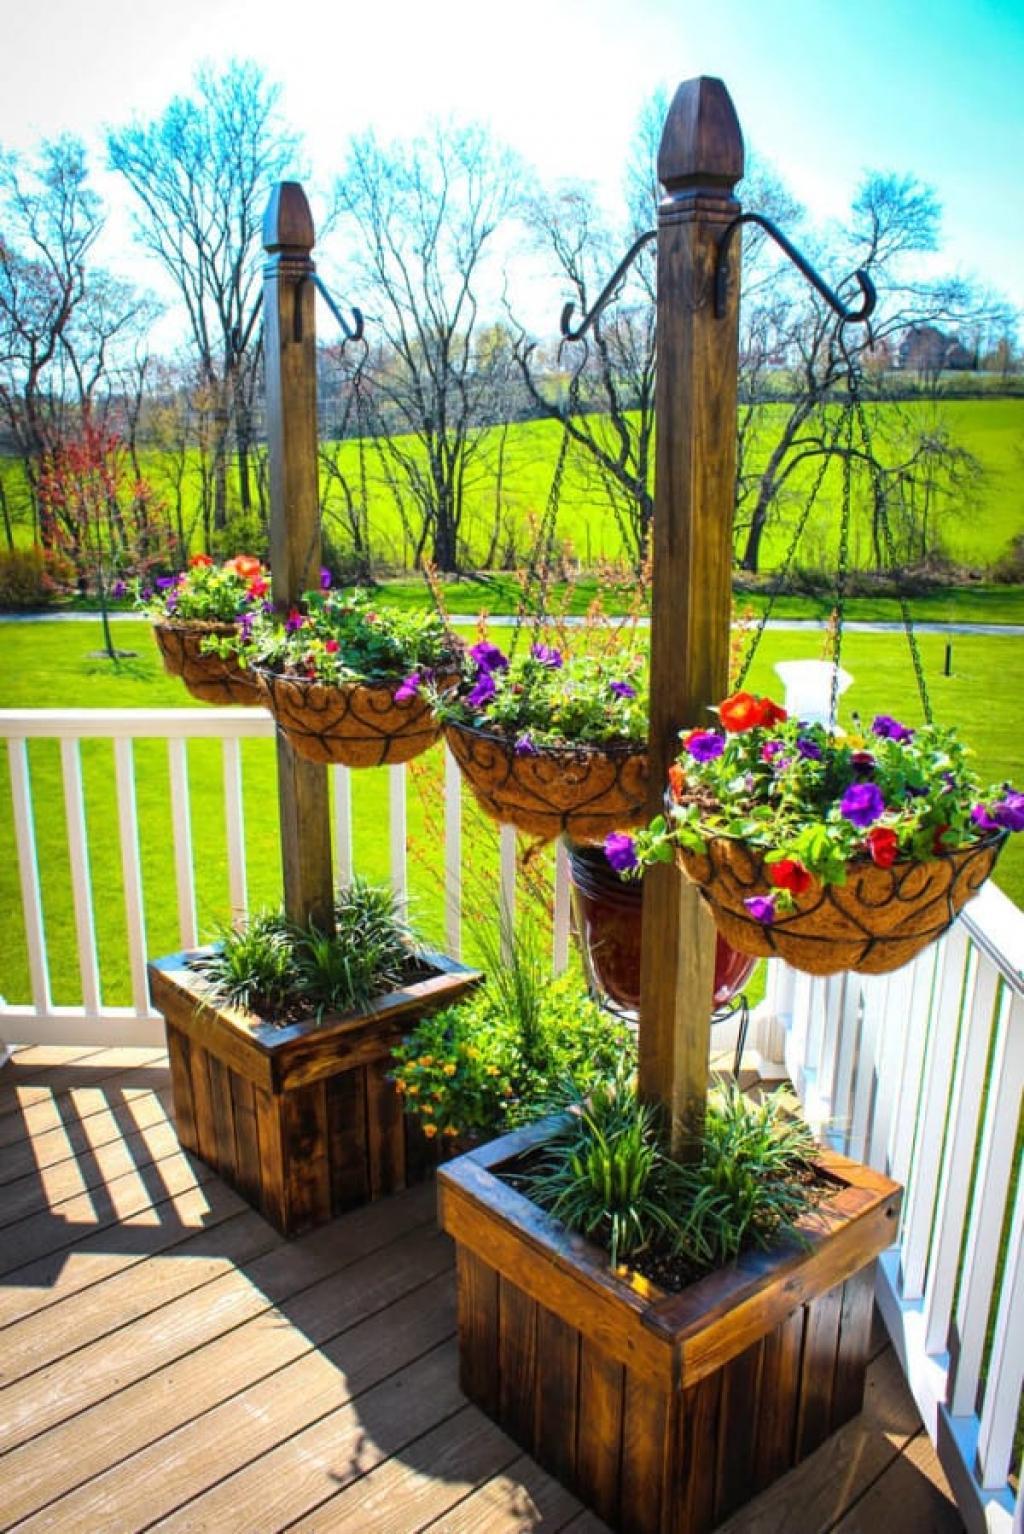 Backyard Landscape: 16 Amazing DIY Patio Decoration Ideas ... on Diy Back Patio Ideas id=60971